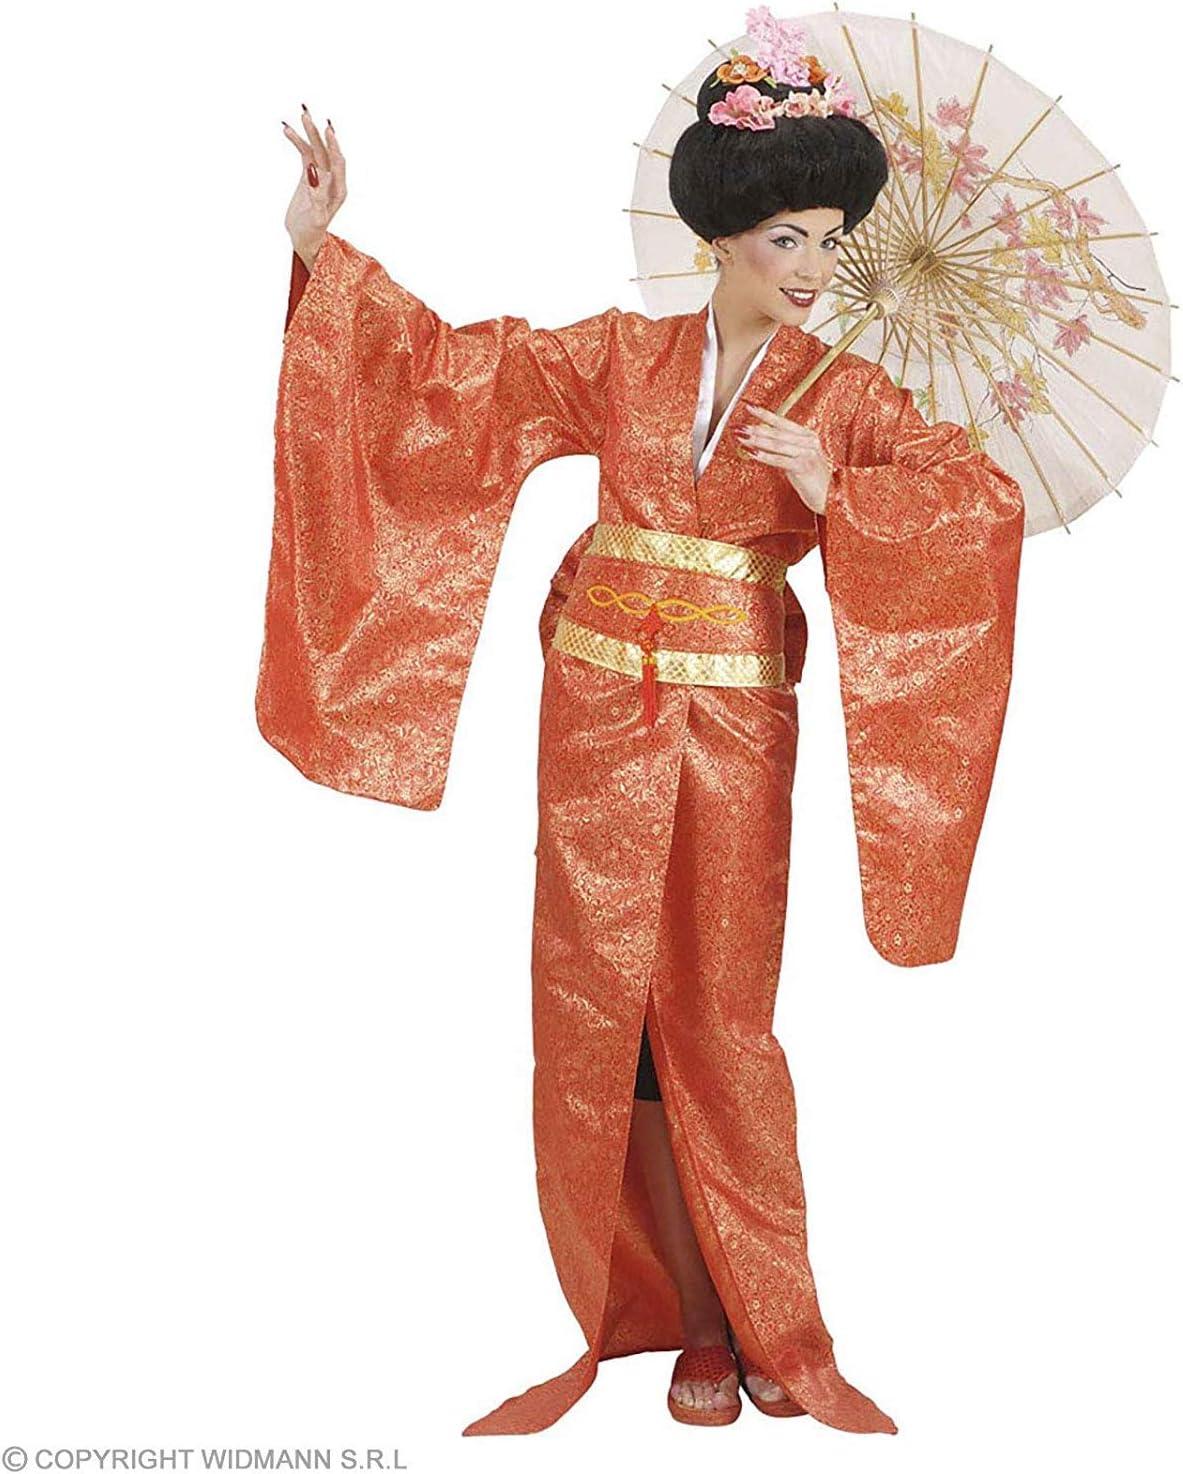 WIDMANN wdm90573 ? Disfraz para adultos Geisha, multicolor, L ...